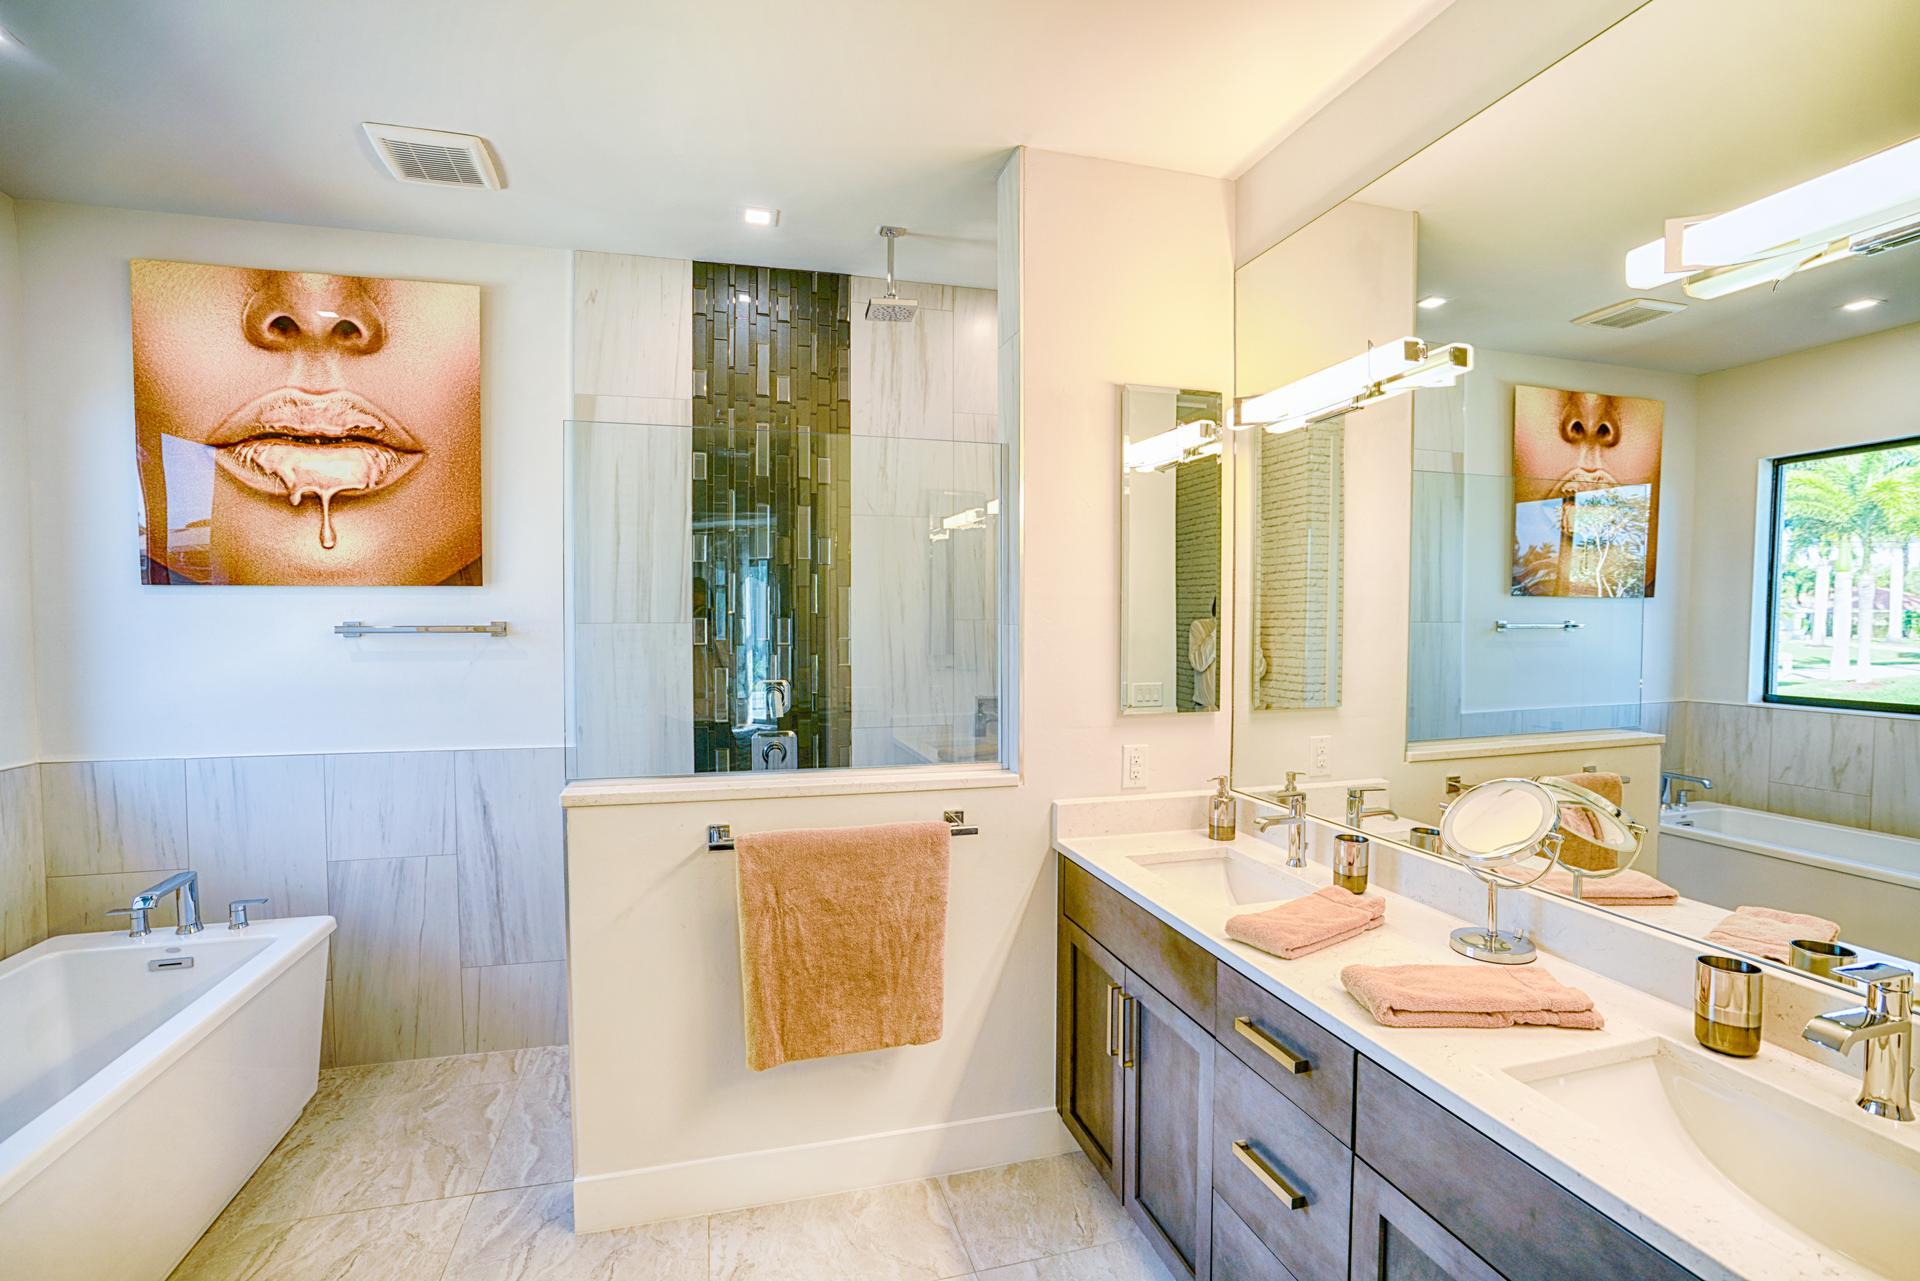 Bathrooms in Florida